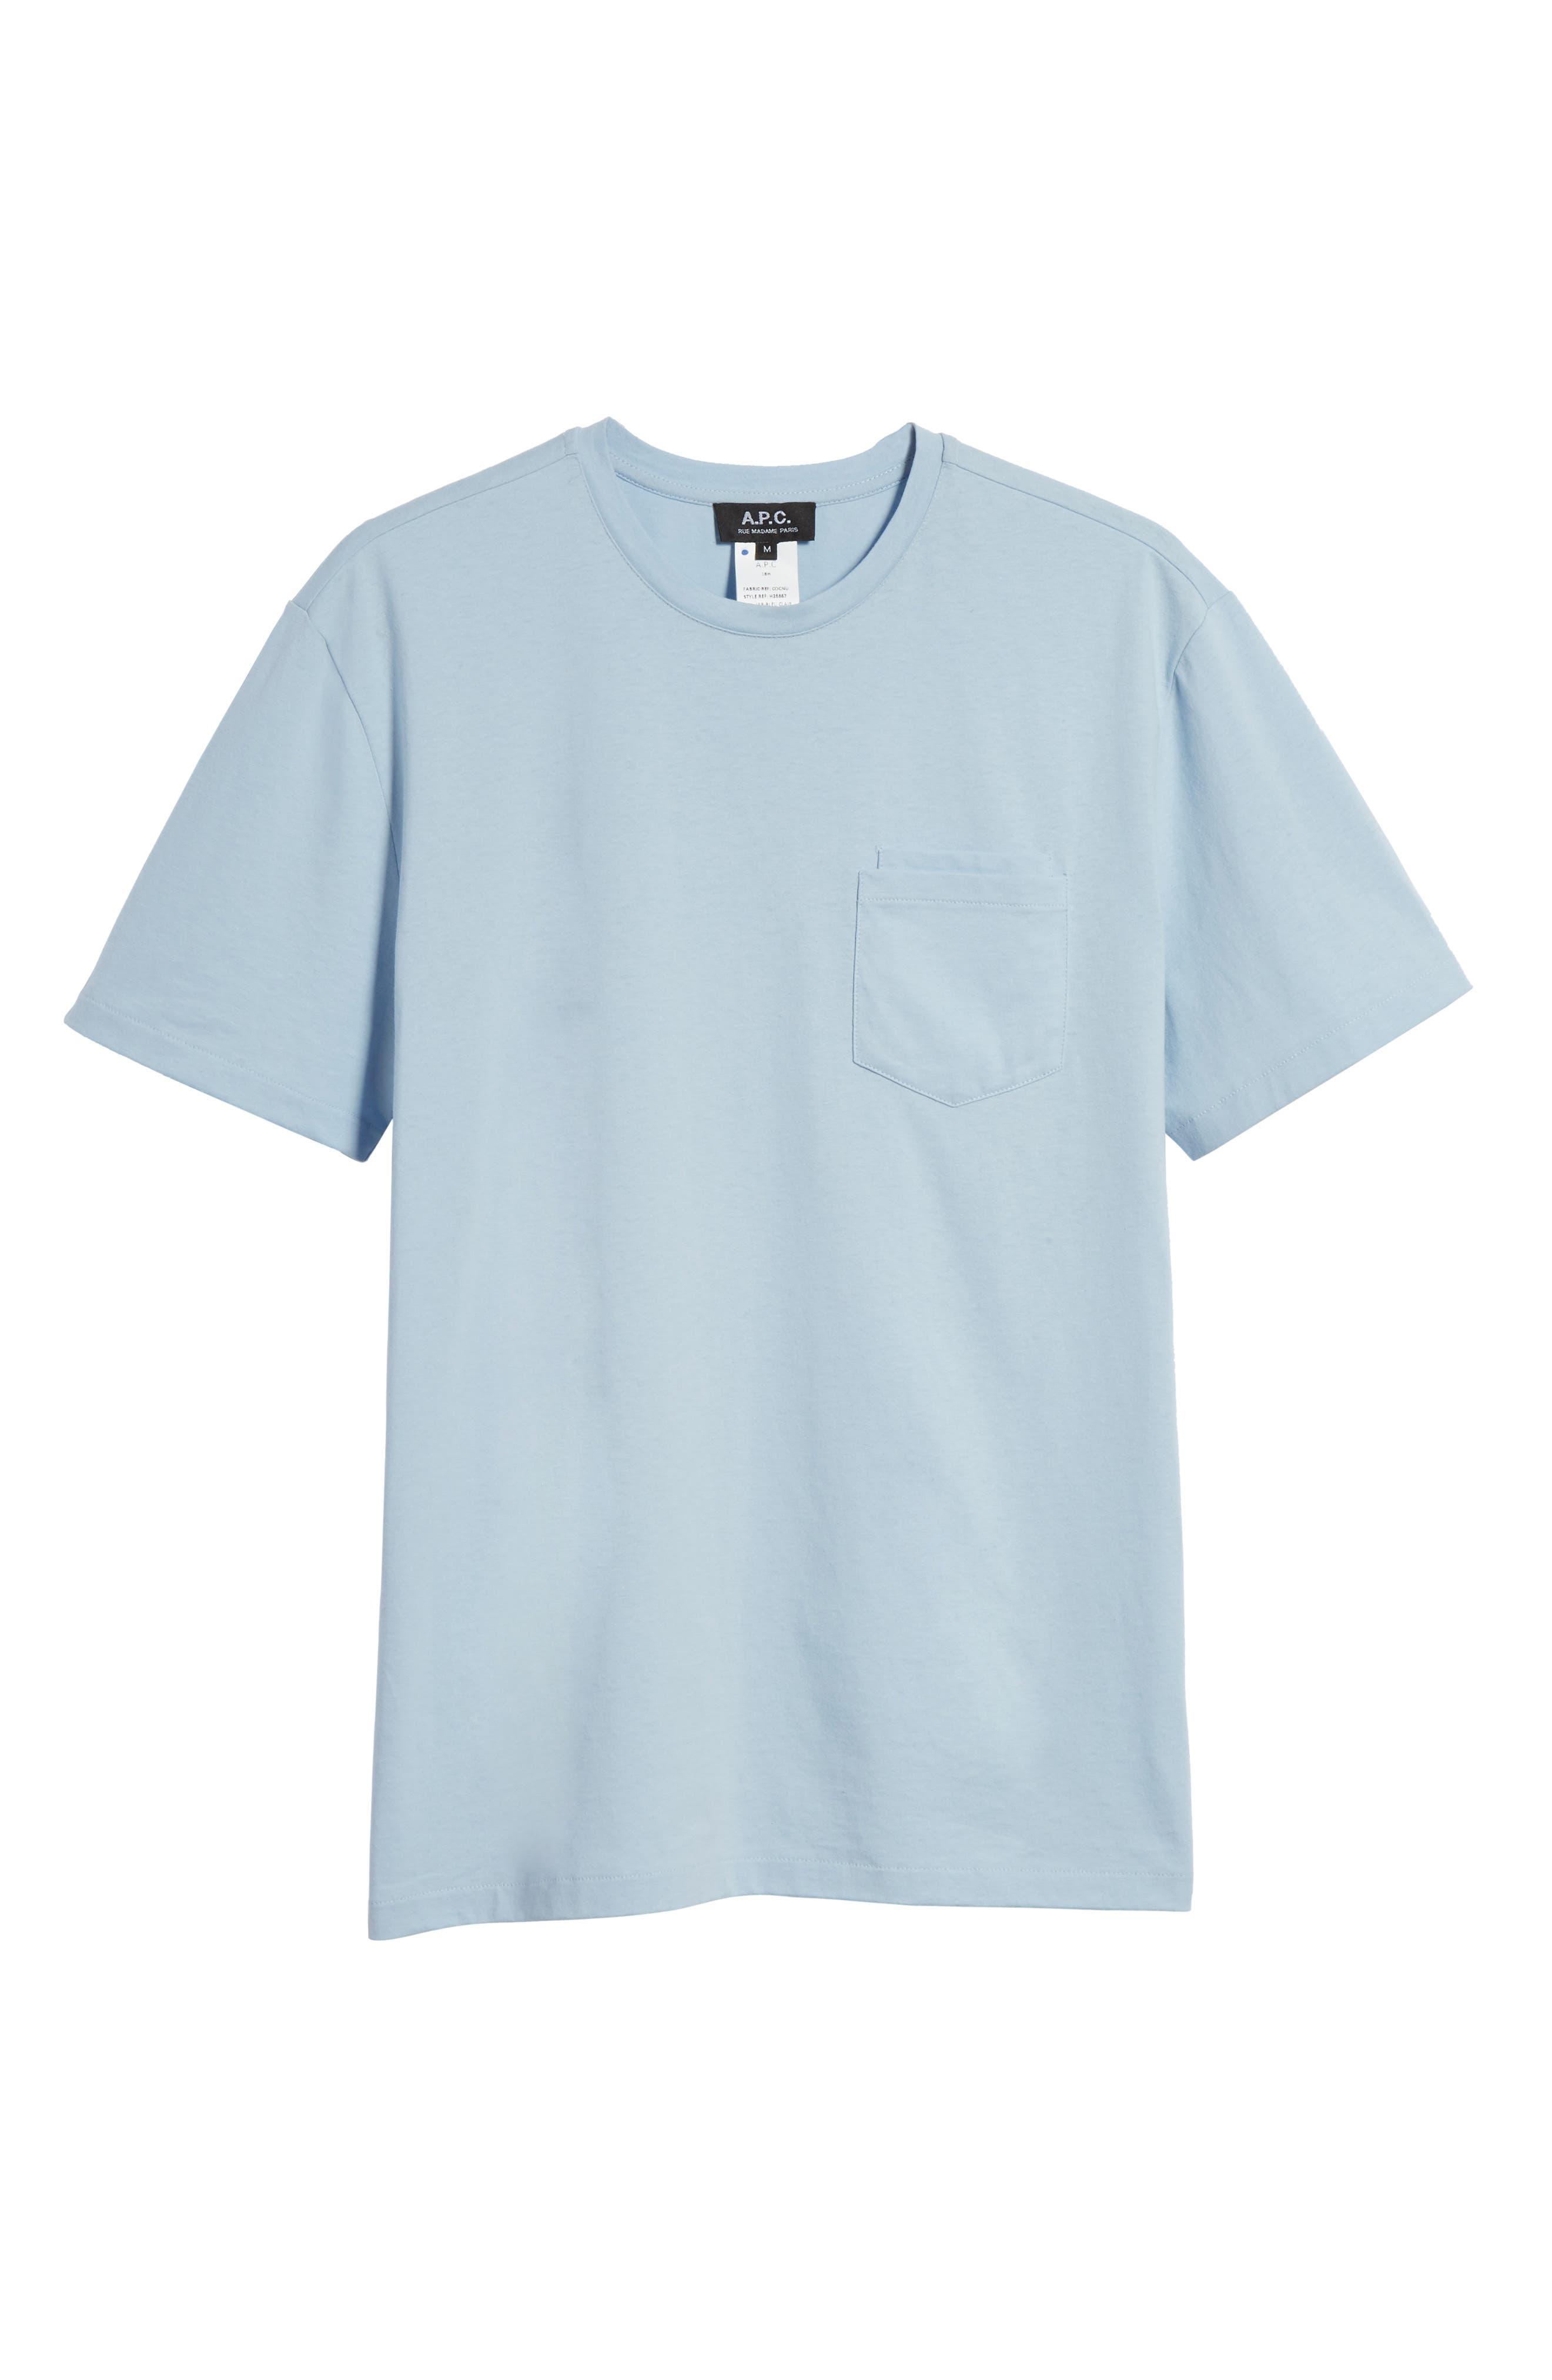 Double Pocket T-Shirt,                             Alternate thumbnail 6, color,                             BLUE